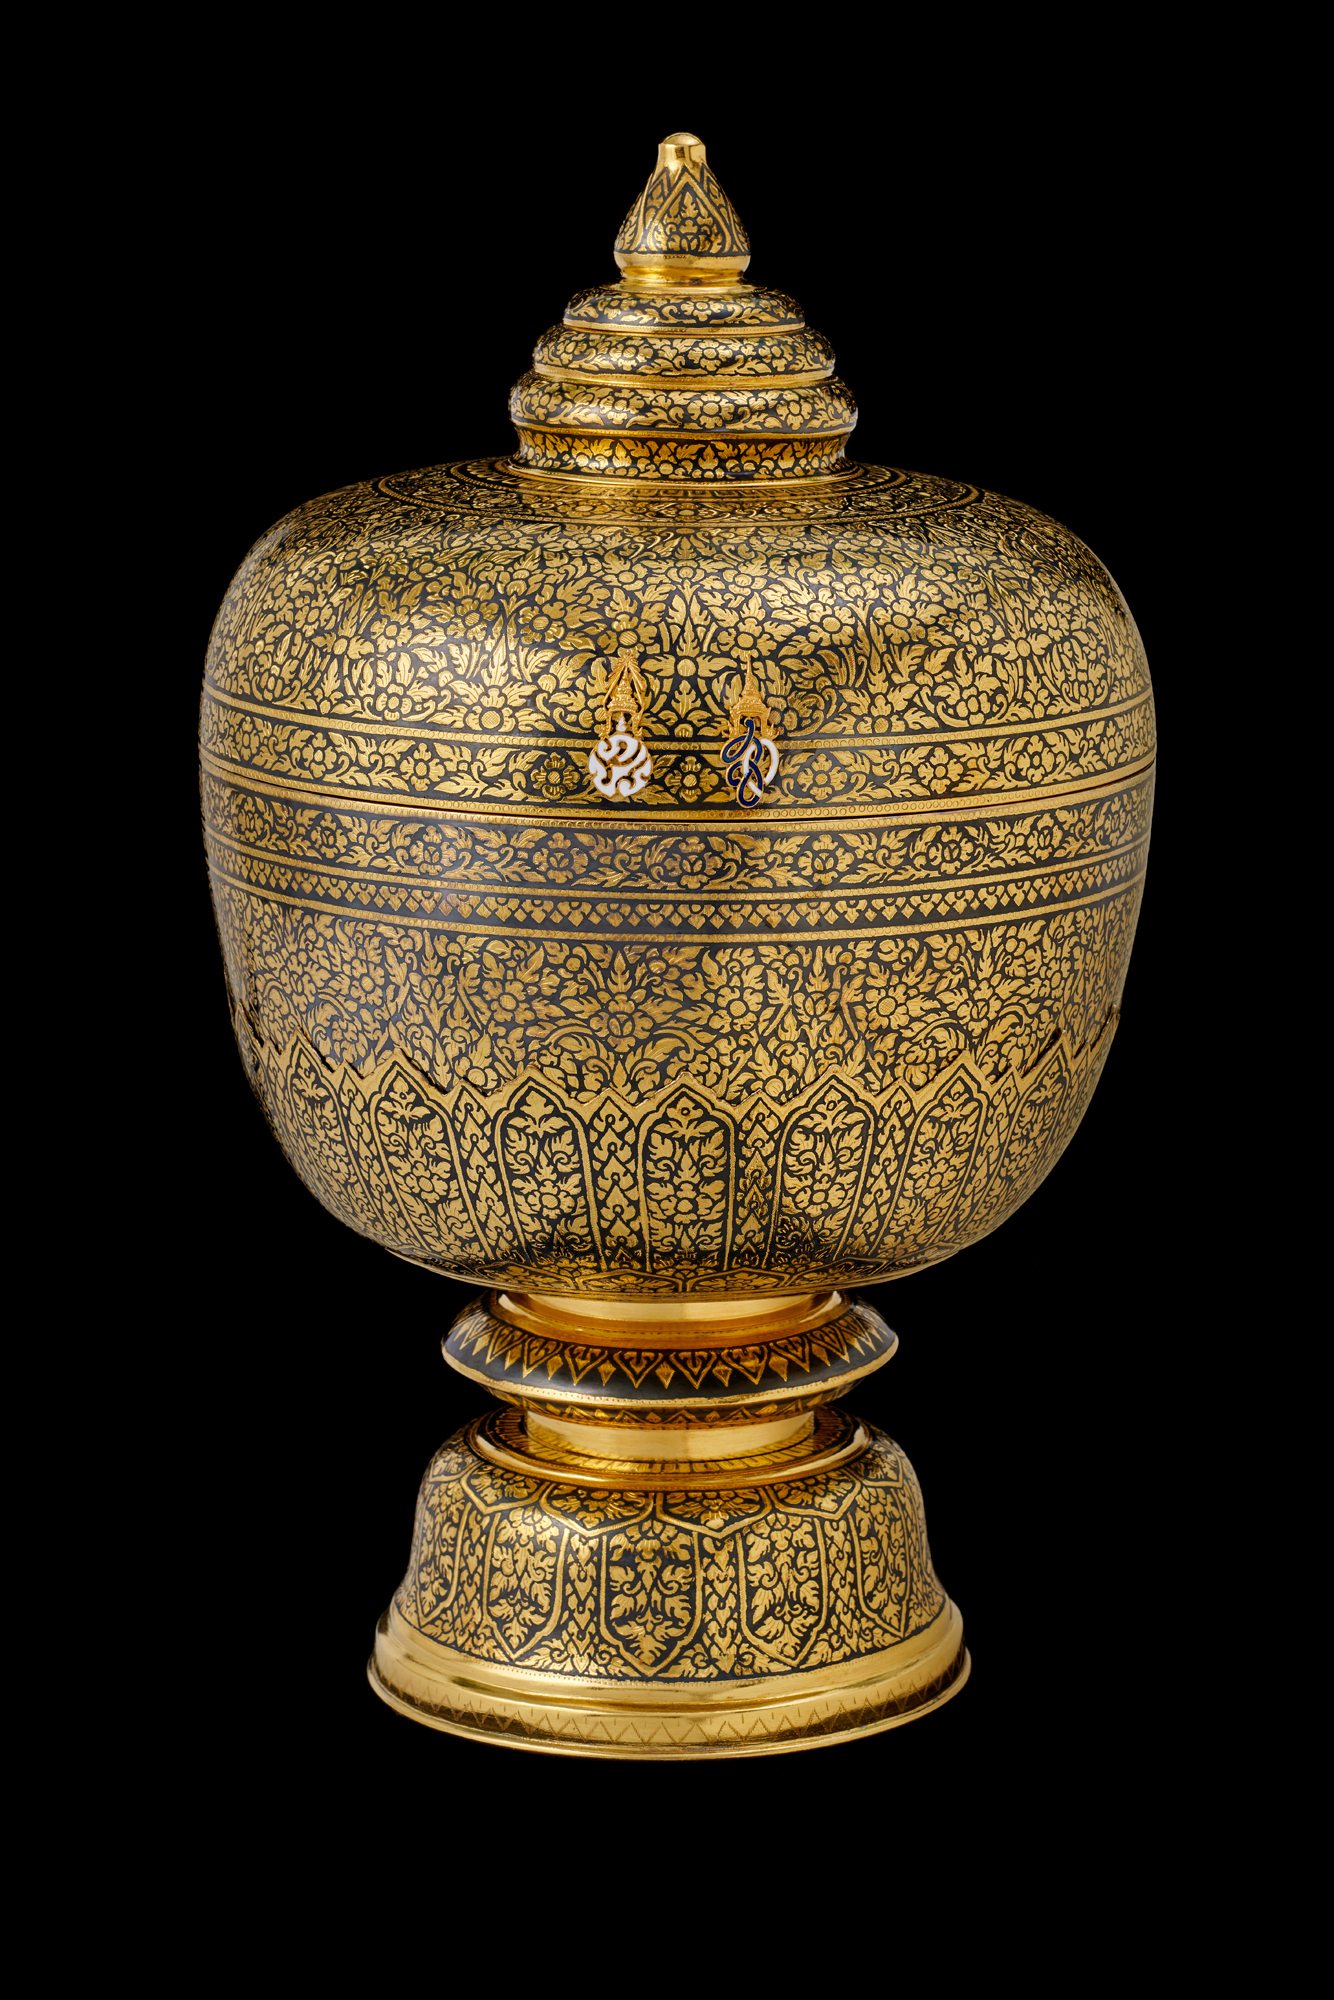 Gold Niello Covered Bowl with Gold Royal Cyphers Gift from King Bhumibol Adulyadej to President George W. Bush, 2003 33.7 x 20.5 cm Courtesy of the George W. Bush Presidential Library and Museum; FO.333417.2.a-b  โถถมทองประดับอักษรพระปรมาภิไธยพระบาทสมเด็จพระปรมินทรมหาภูมิพลอดุลยเดช บรมนาถบพิตร ภายใต้พระมหาพิชัยมงกุฎ และอักษรพระนามาภิไธยสมเด็จพระนางเจ้าสิริกิติ์ พระบรมราชินีนาถ ภายใต้พระมหามงกุฎ ของขวัญพระราชทานจากพระบาทสมเด็จพระปรมินทรมหาภูมิพลอดุลยเดช แก่ประธานาธิบดีจอร์จ ดับเบิลยู. บุช พ.ศ. ๒๕๔๖ ๓๓.๗ x ๒๐.๕ ซม. ได้รับความอนุเคราะห์จากพิพิธภัณฑ์และหอสมุดประธานาธิบดีจอร์จ ดับเบิลยู. บุช; FO.333417.2.a-b